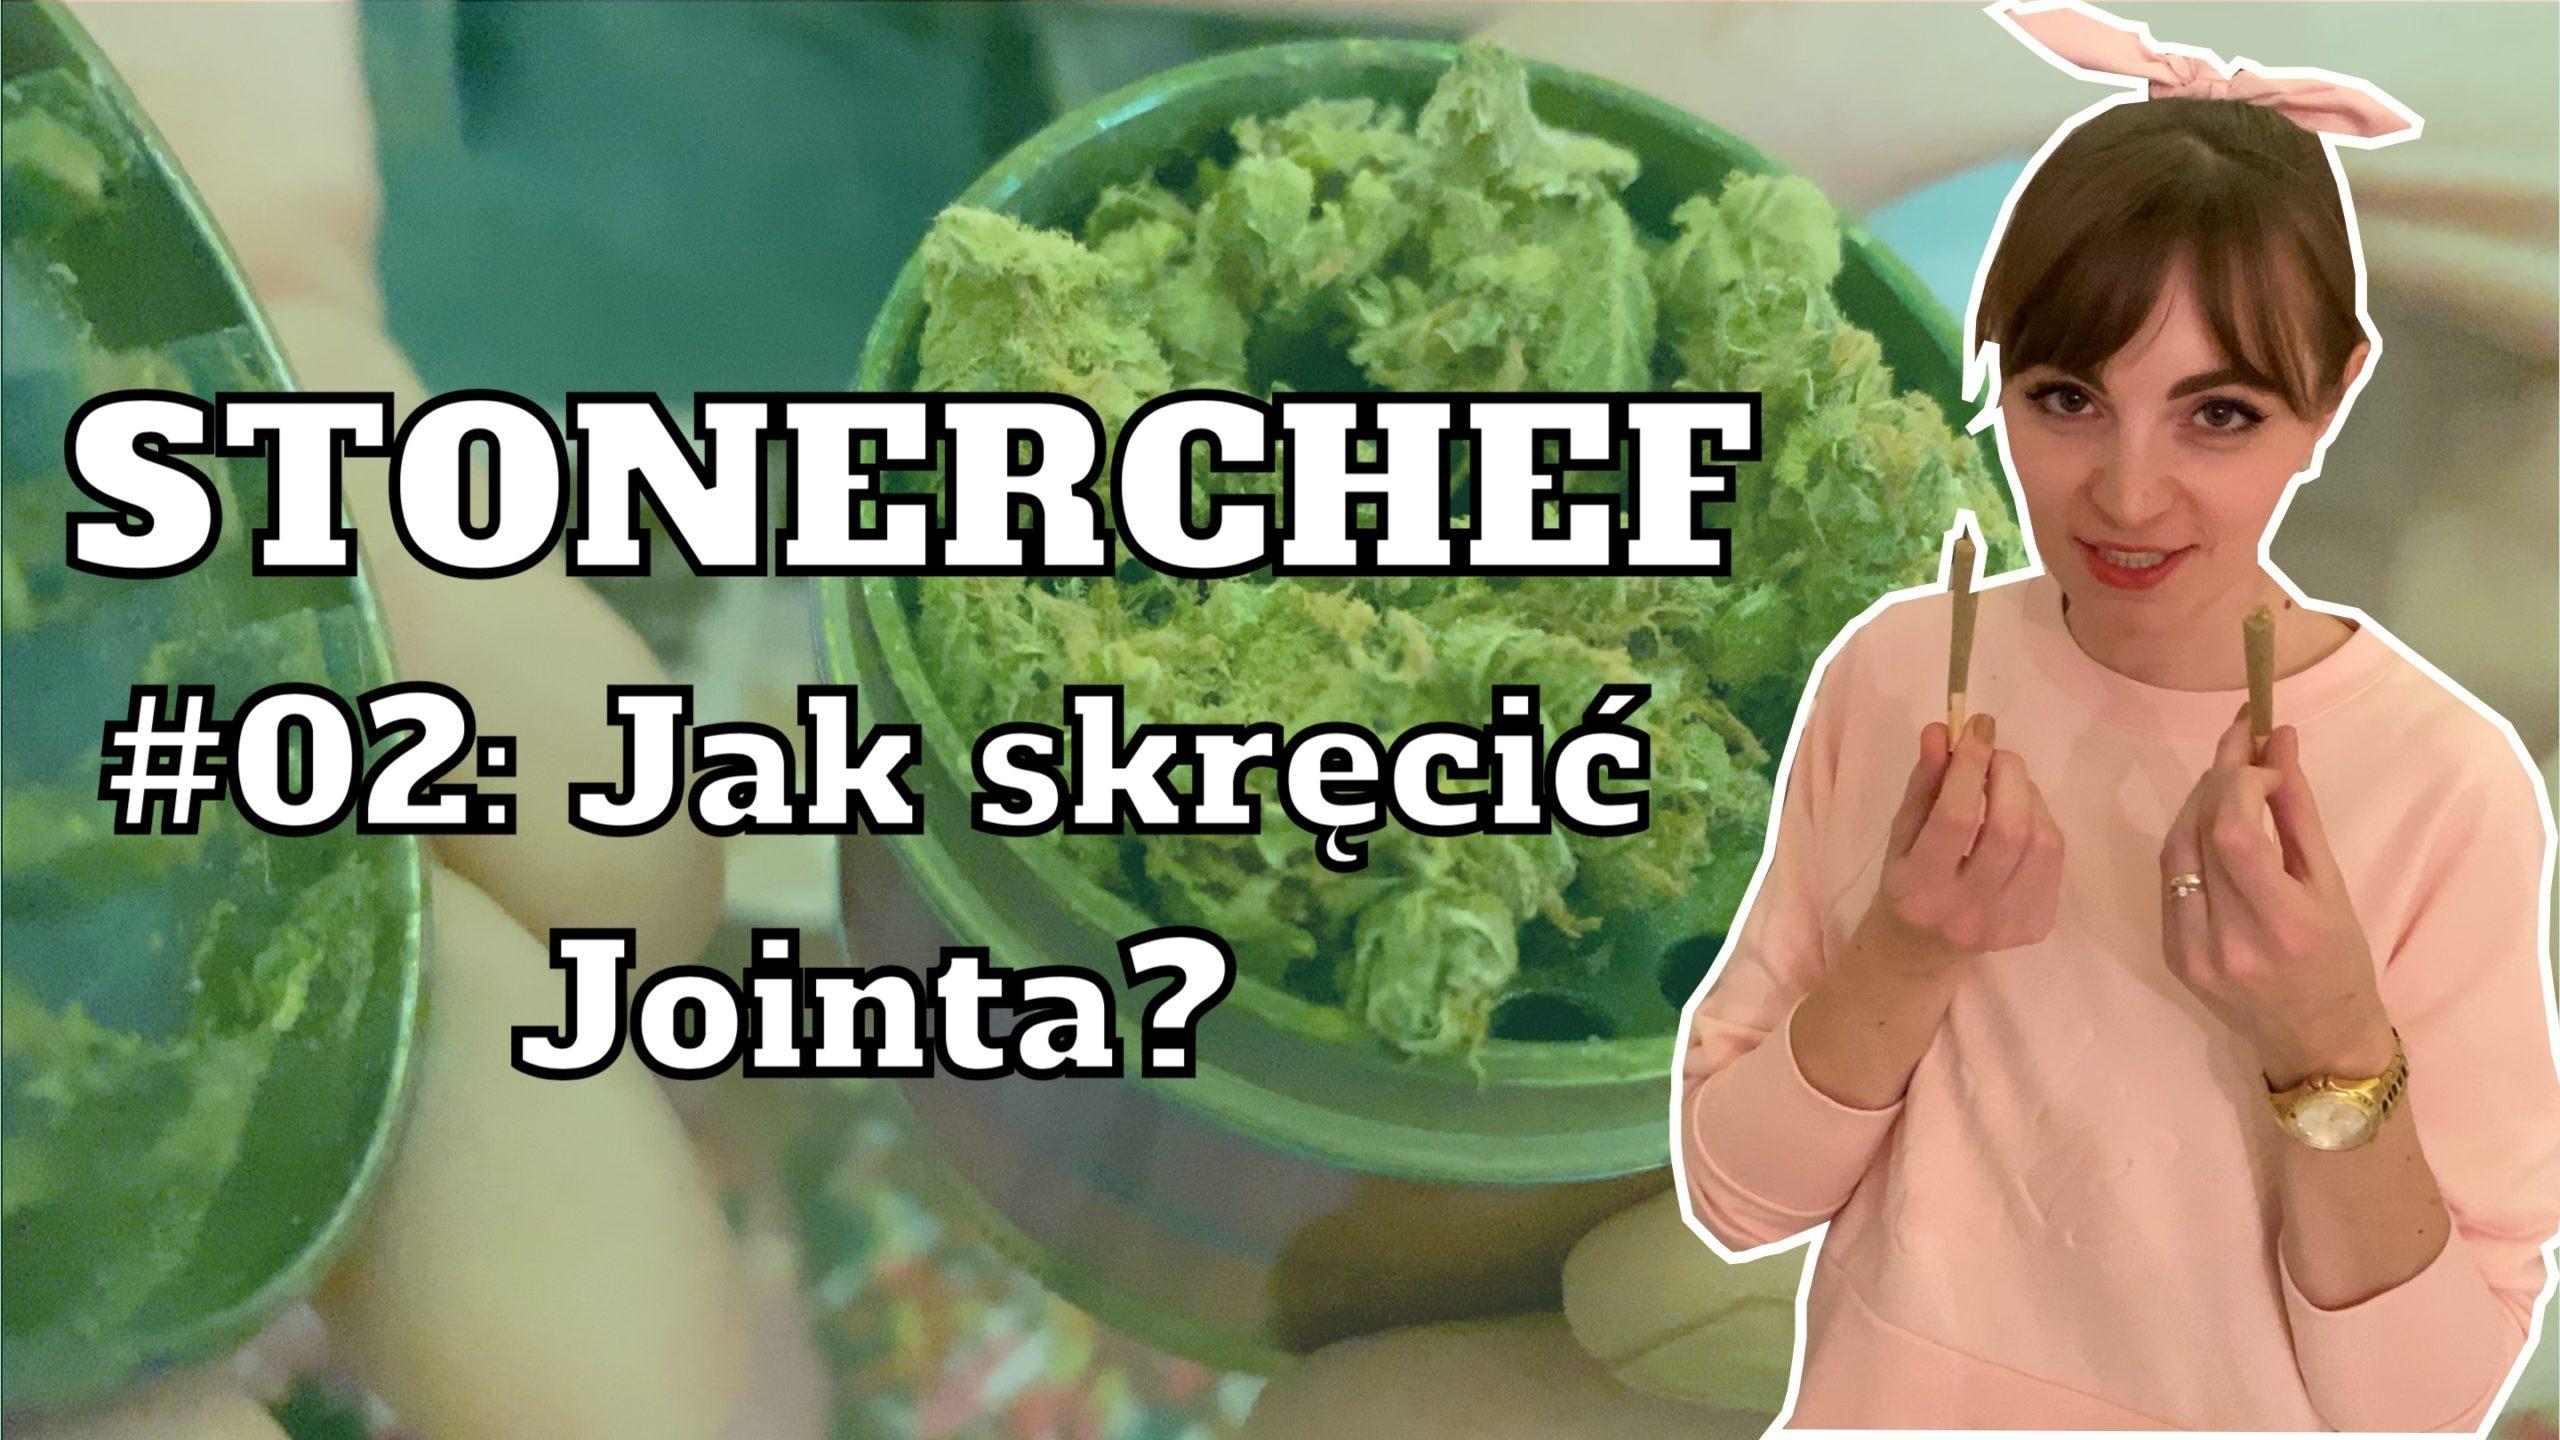 http://www.stonerchef.pl/wp-content/uploads/2019/11/jak-skrecic-jointa-scaled.jpg